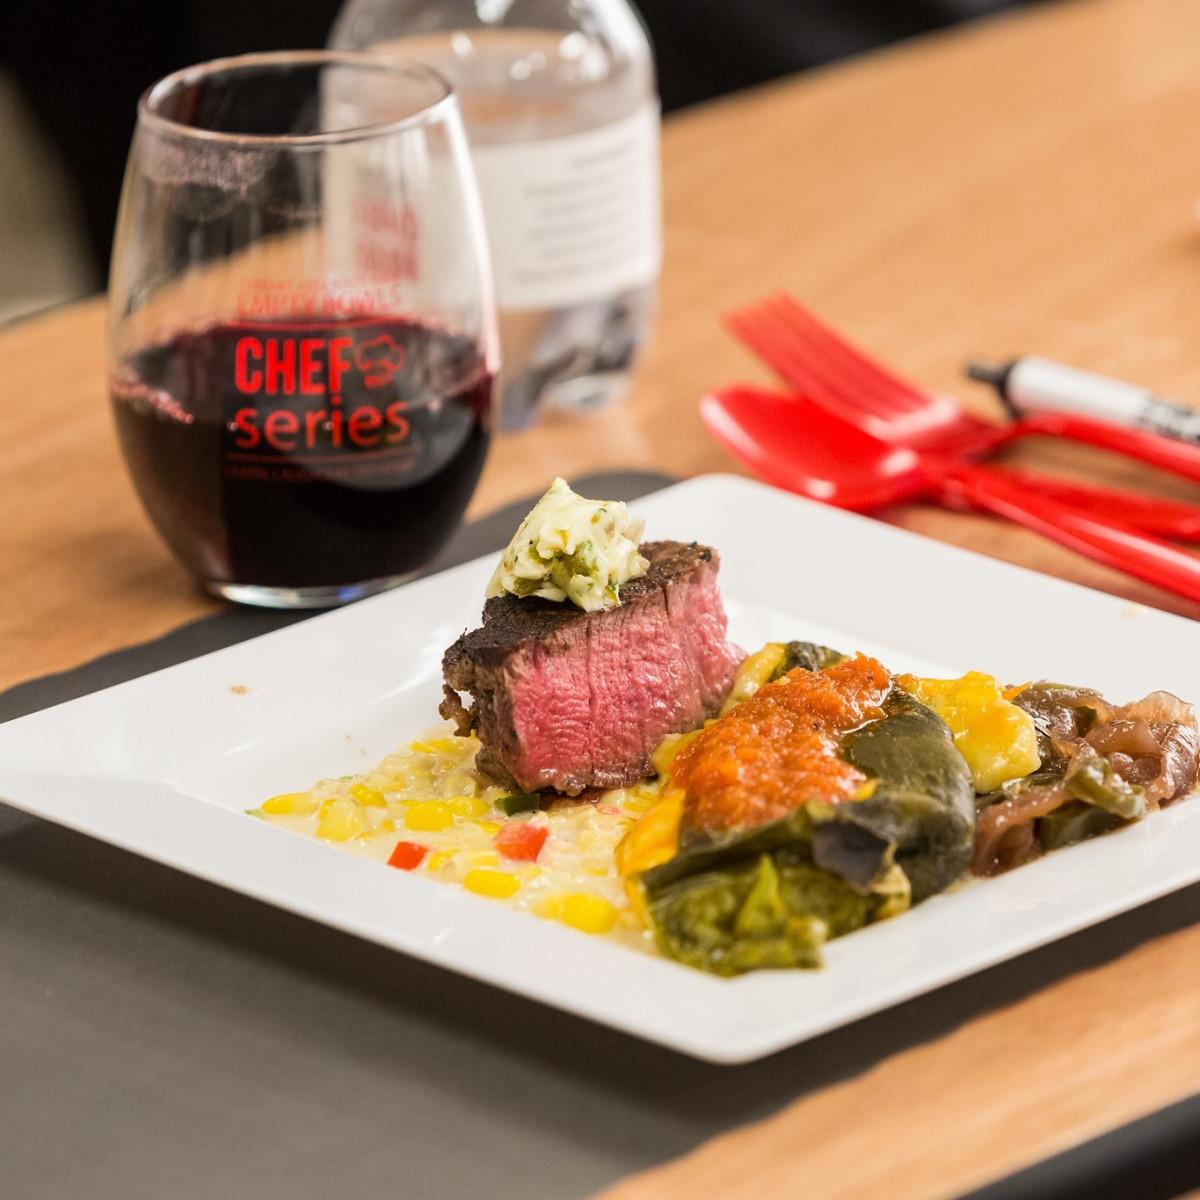 The pan-seared tenderloin filet, Empty Bowls Chefs series